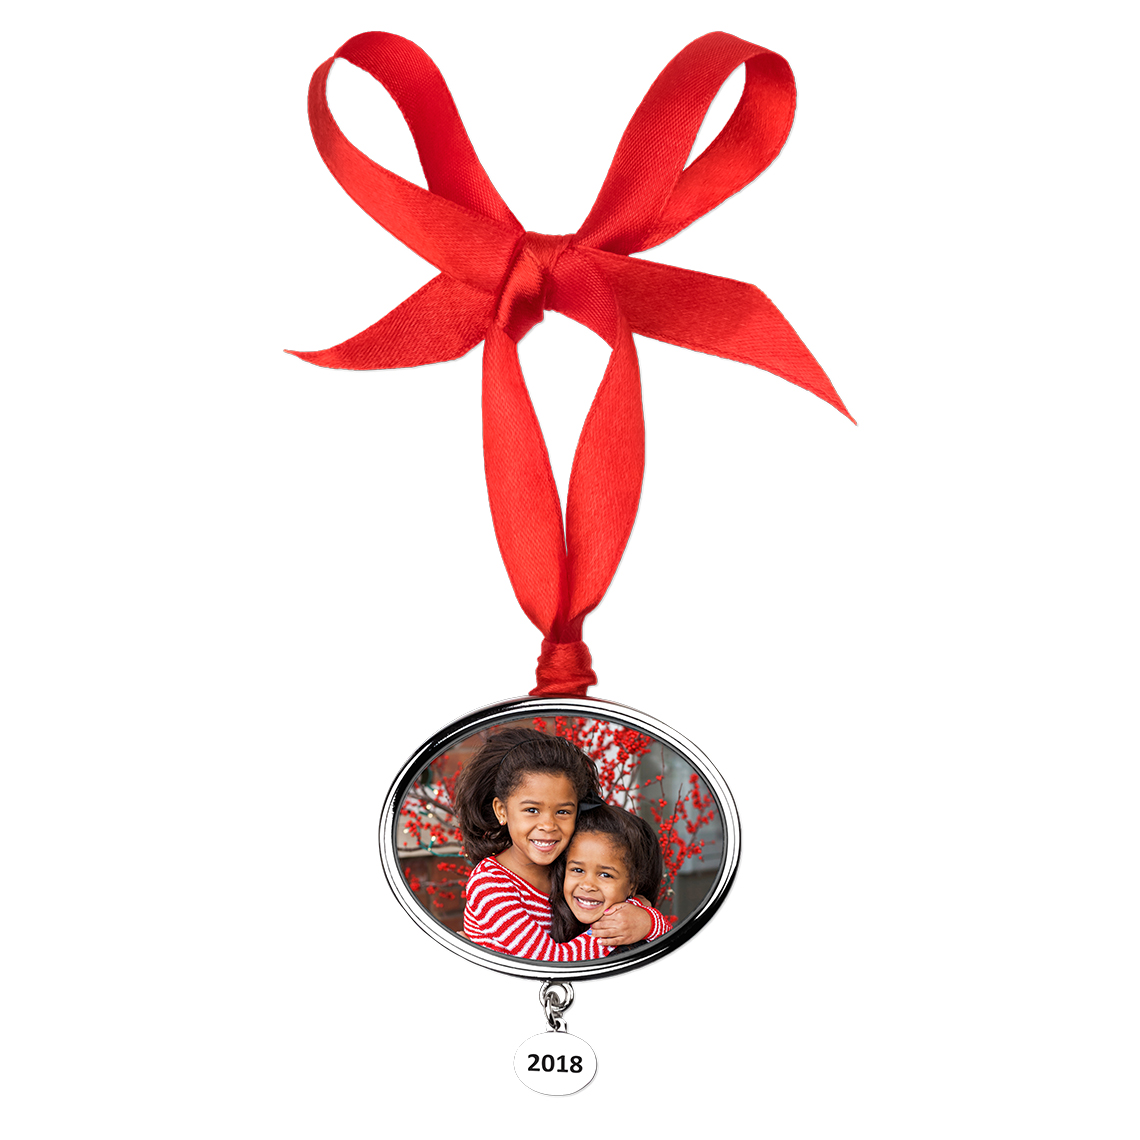 2018 Christmas Photo Ornament | Christmas Ornaments and Decor ...